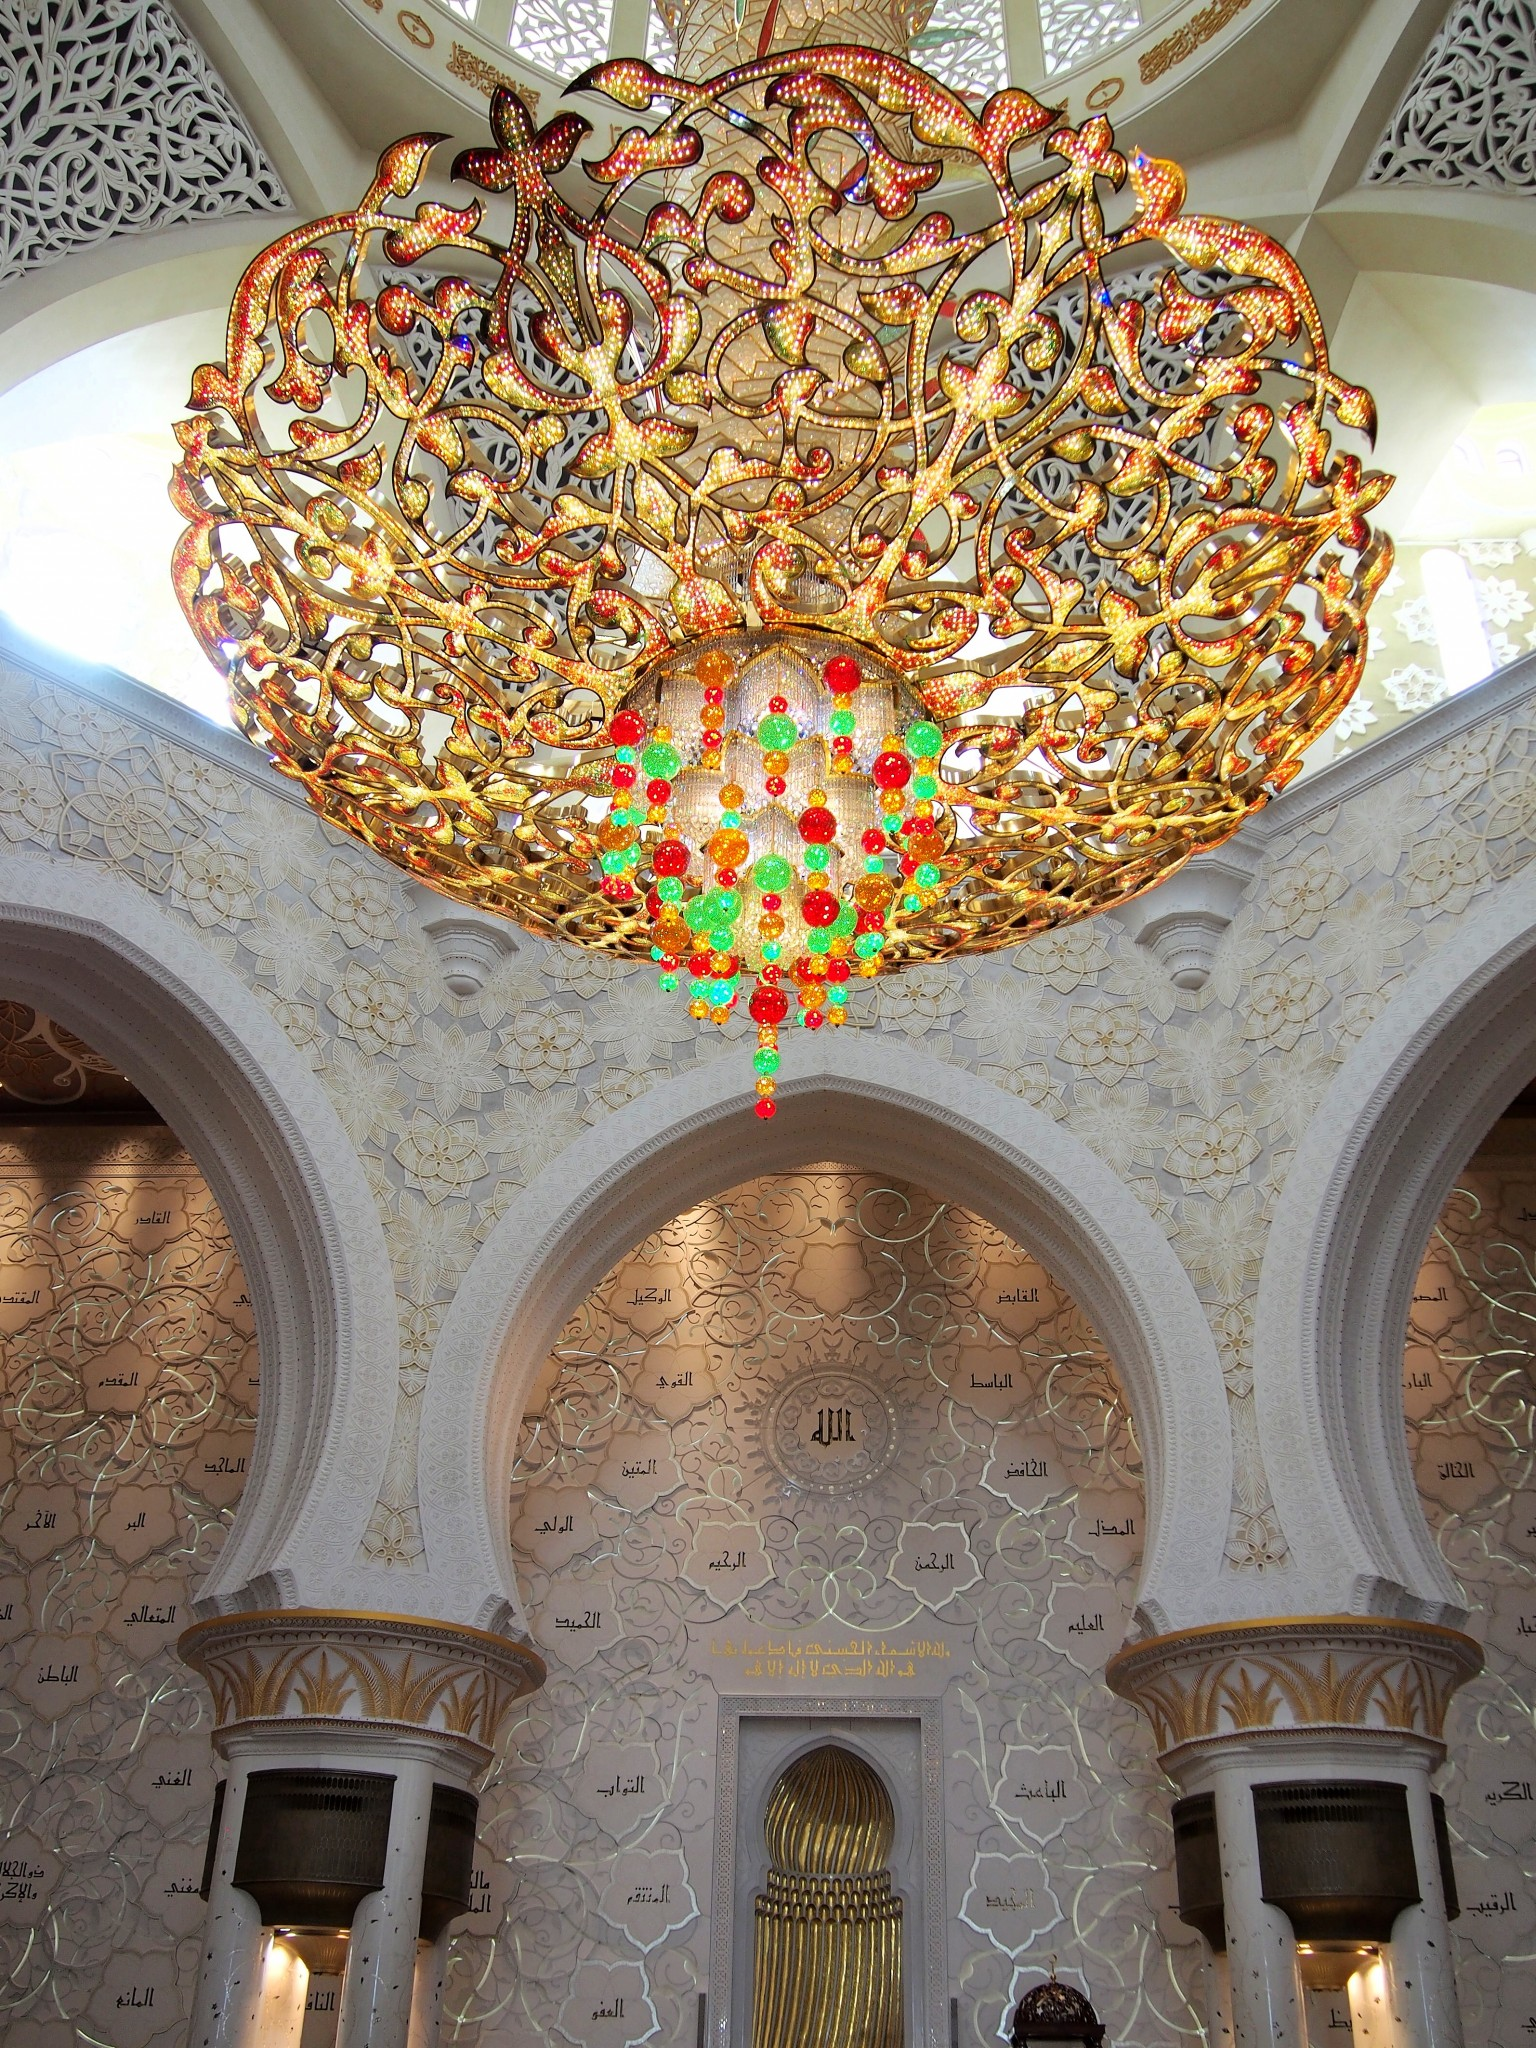 Sheikh Zayed Grand Mosque Abu Dhabi UAE 15 Photo © Elämää ja Matkoja